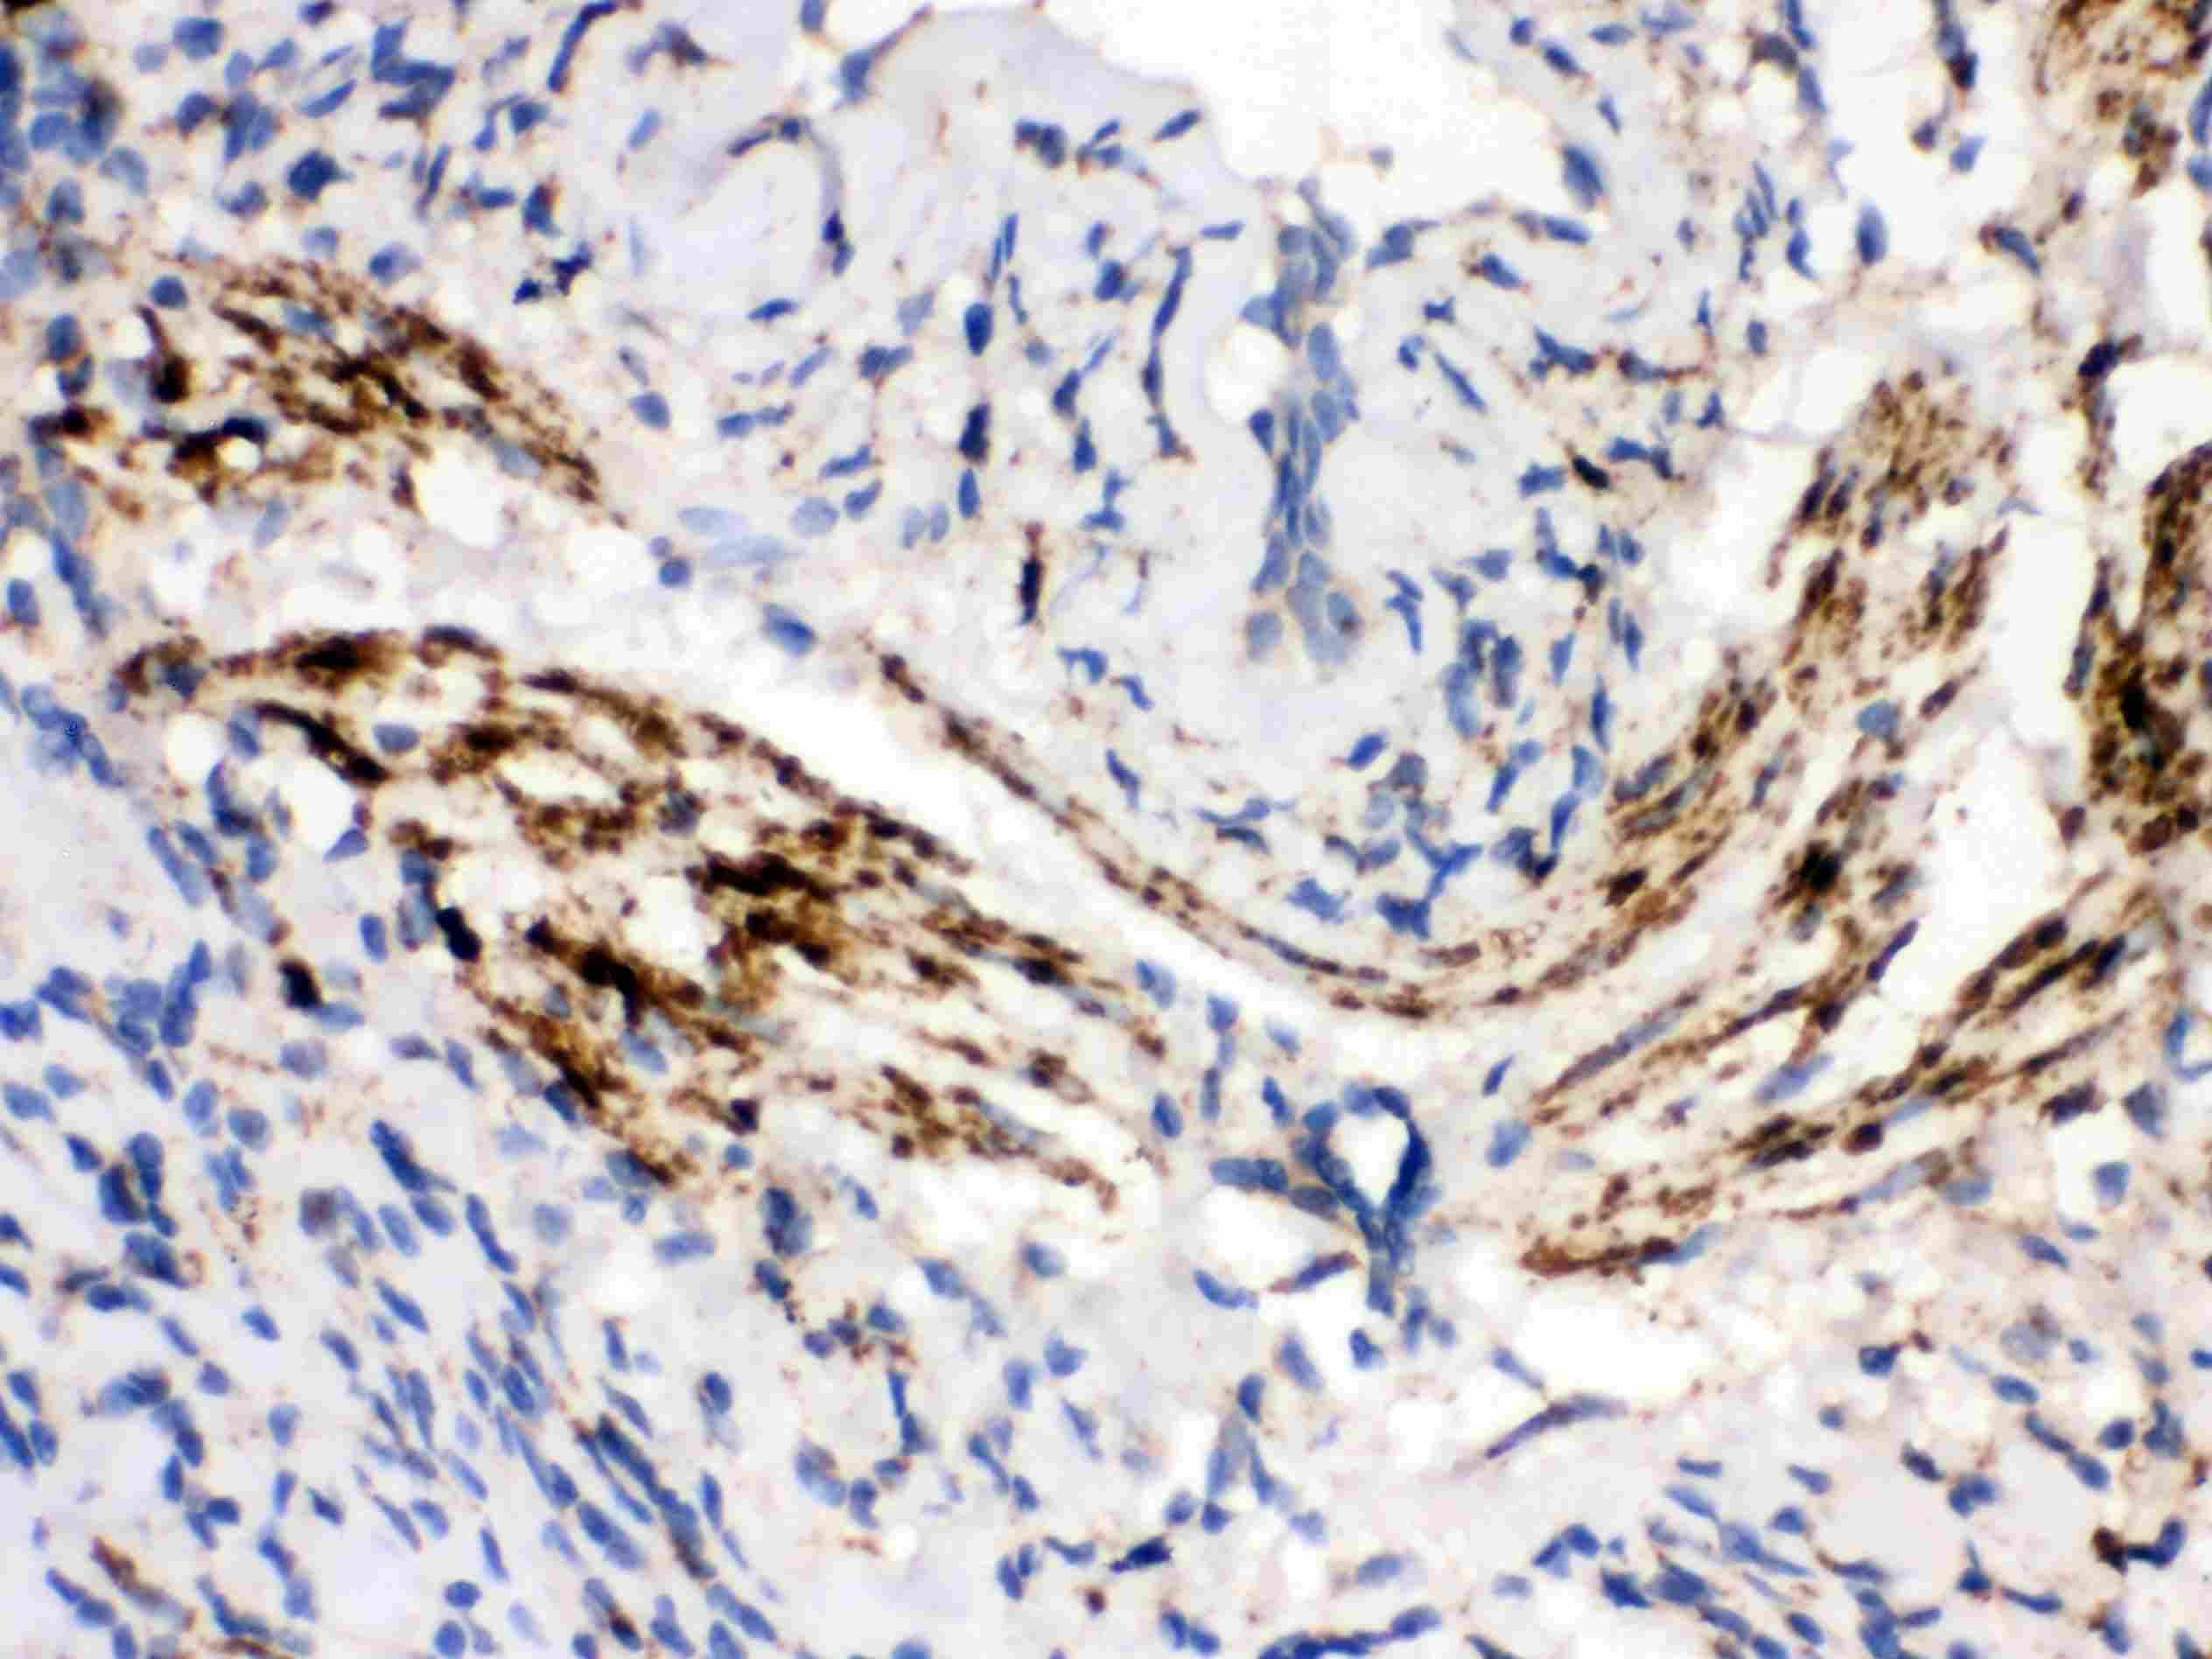 MAOB Antibody in Immunohistochemistry (Paraffin) (IHC (P))